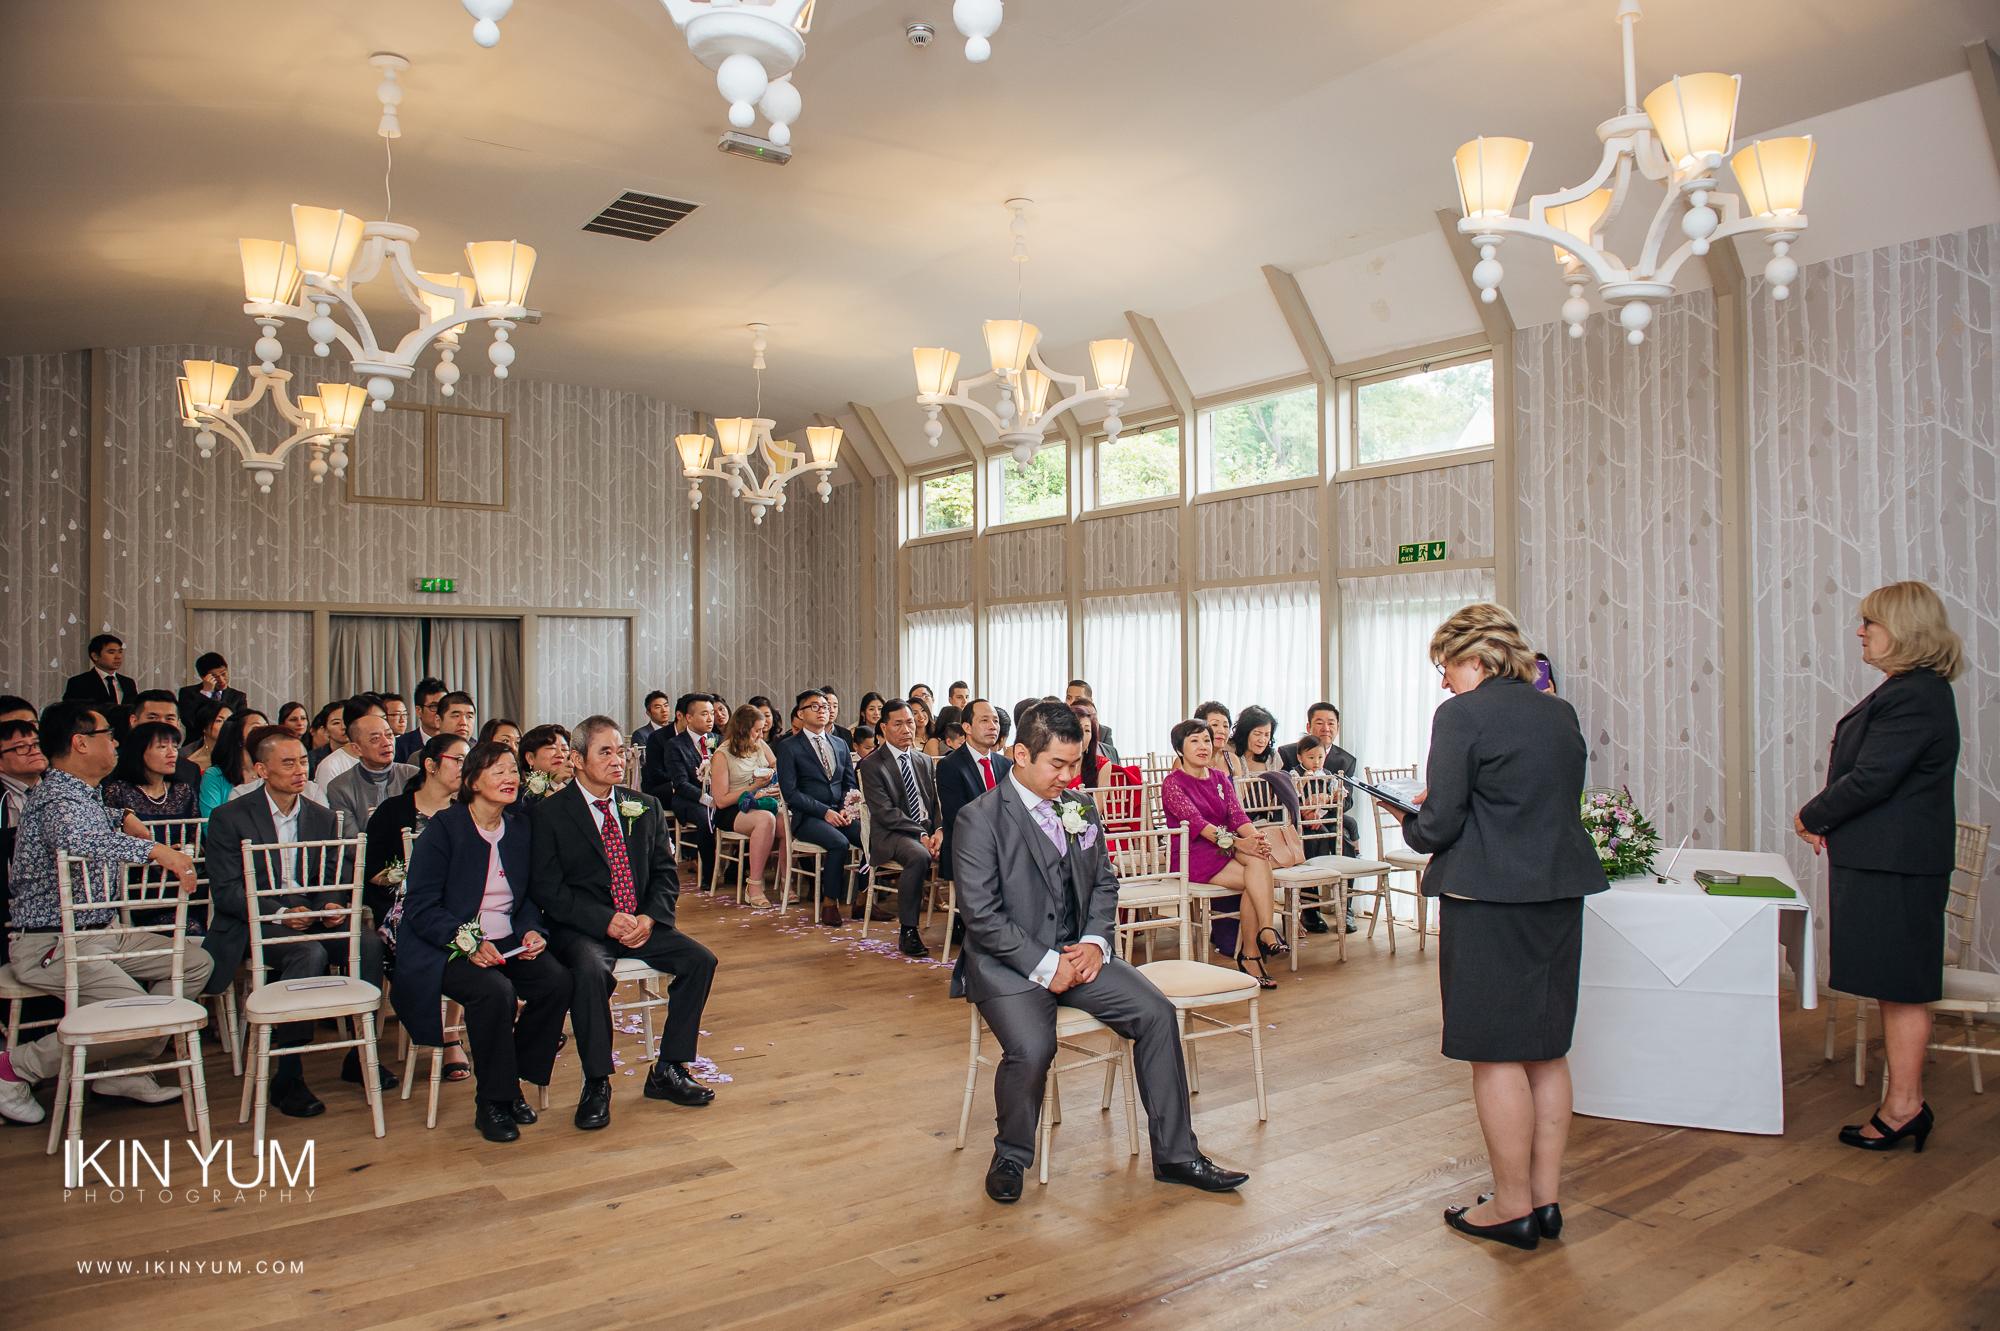 Hampton Manor Wedding - Ikin Yum Photography -070.jpg